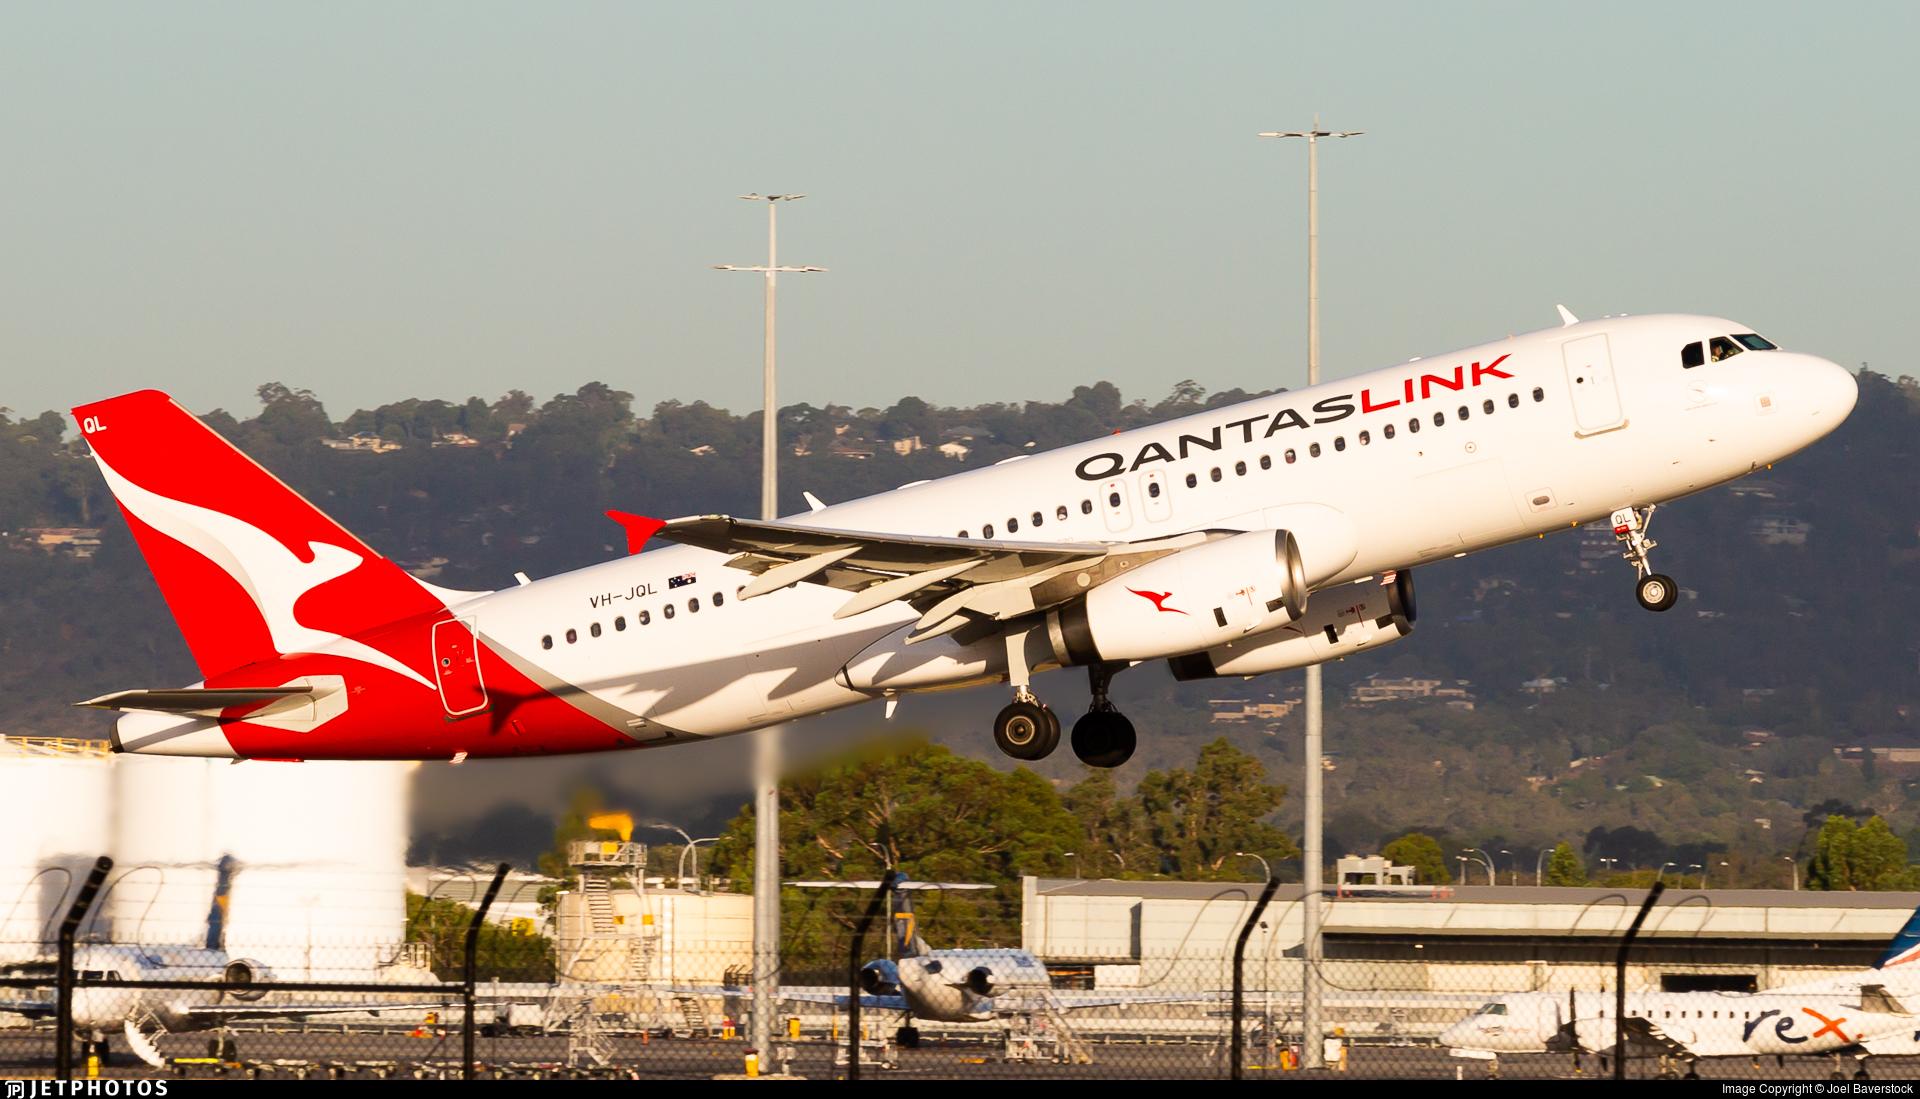 VH-JQL - Airbus A320-232 - QantasLink (Network Aviation)